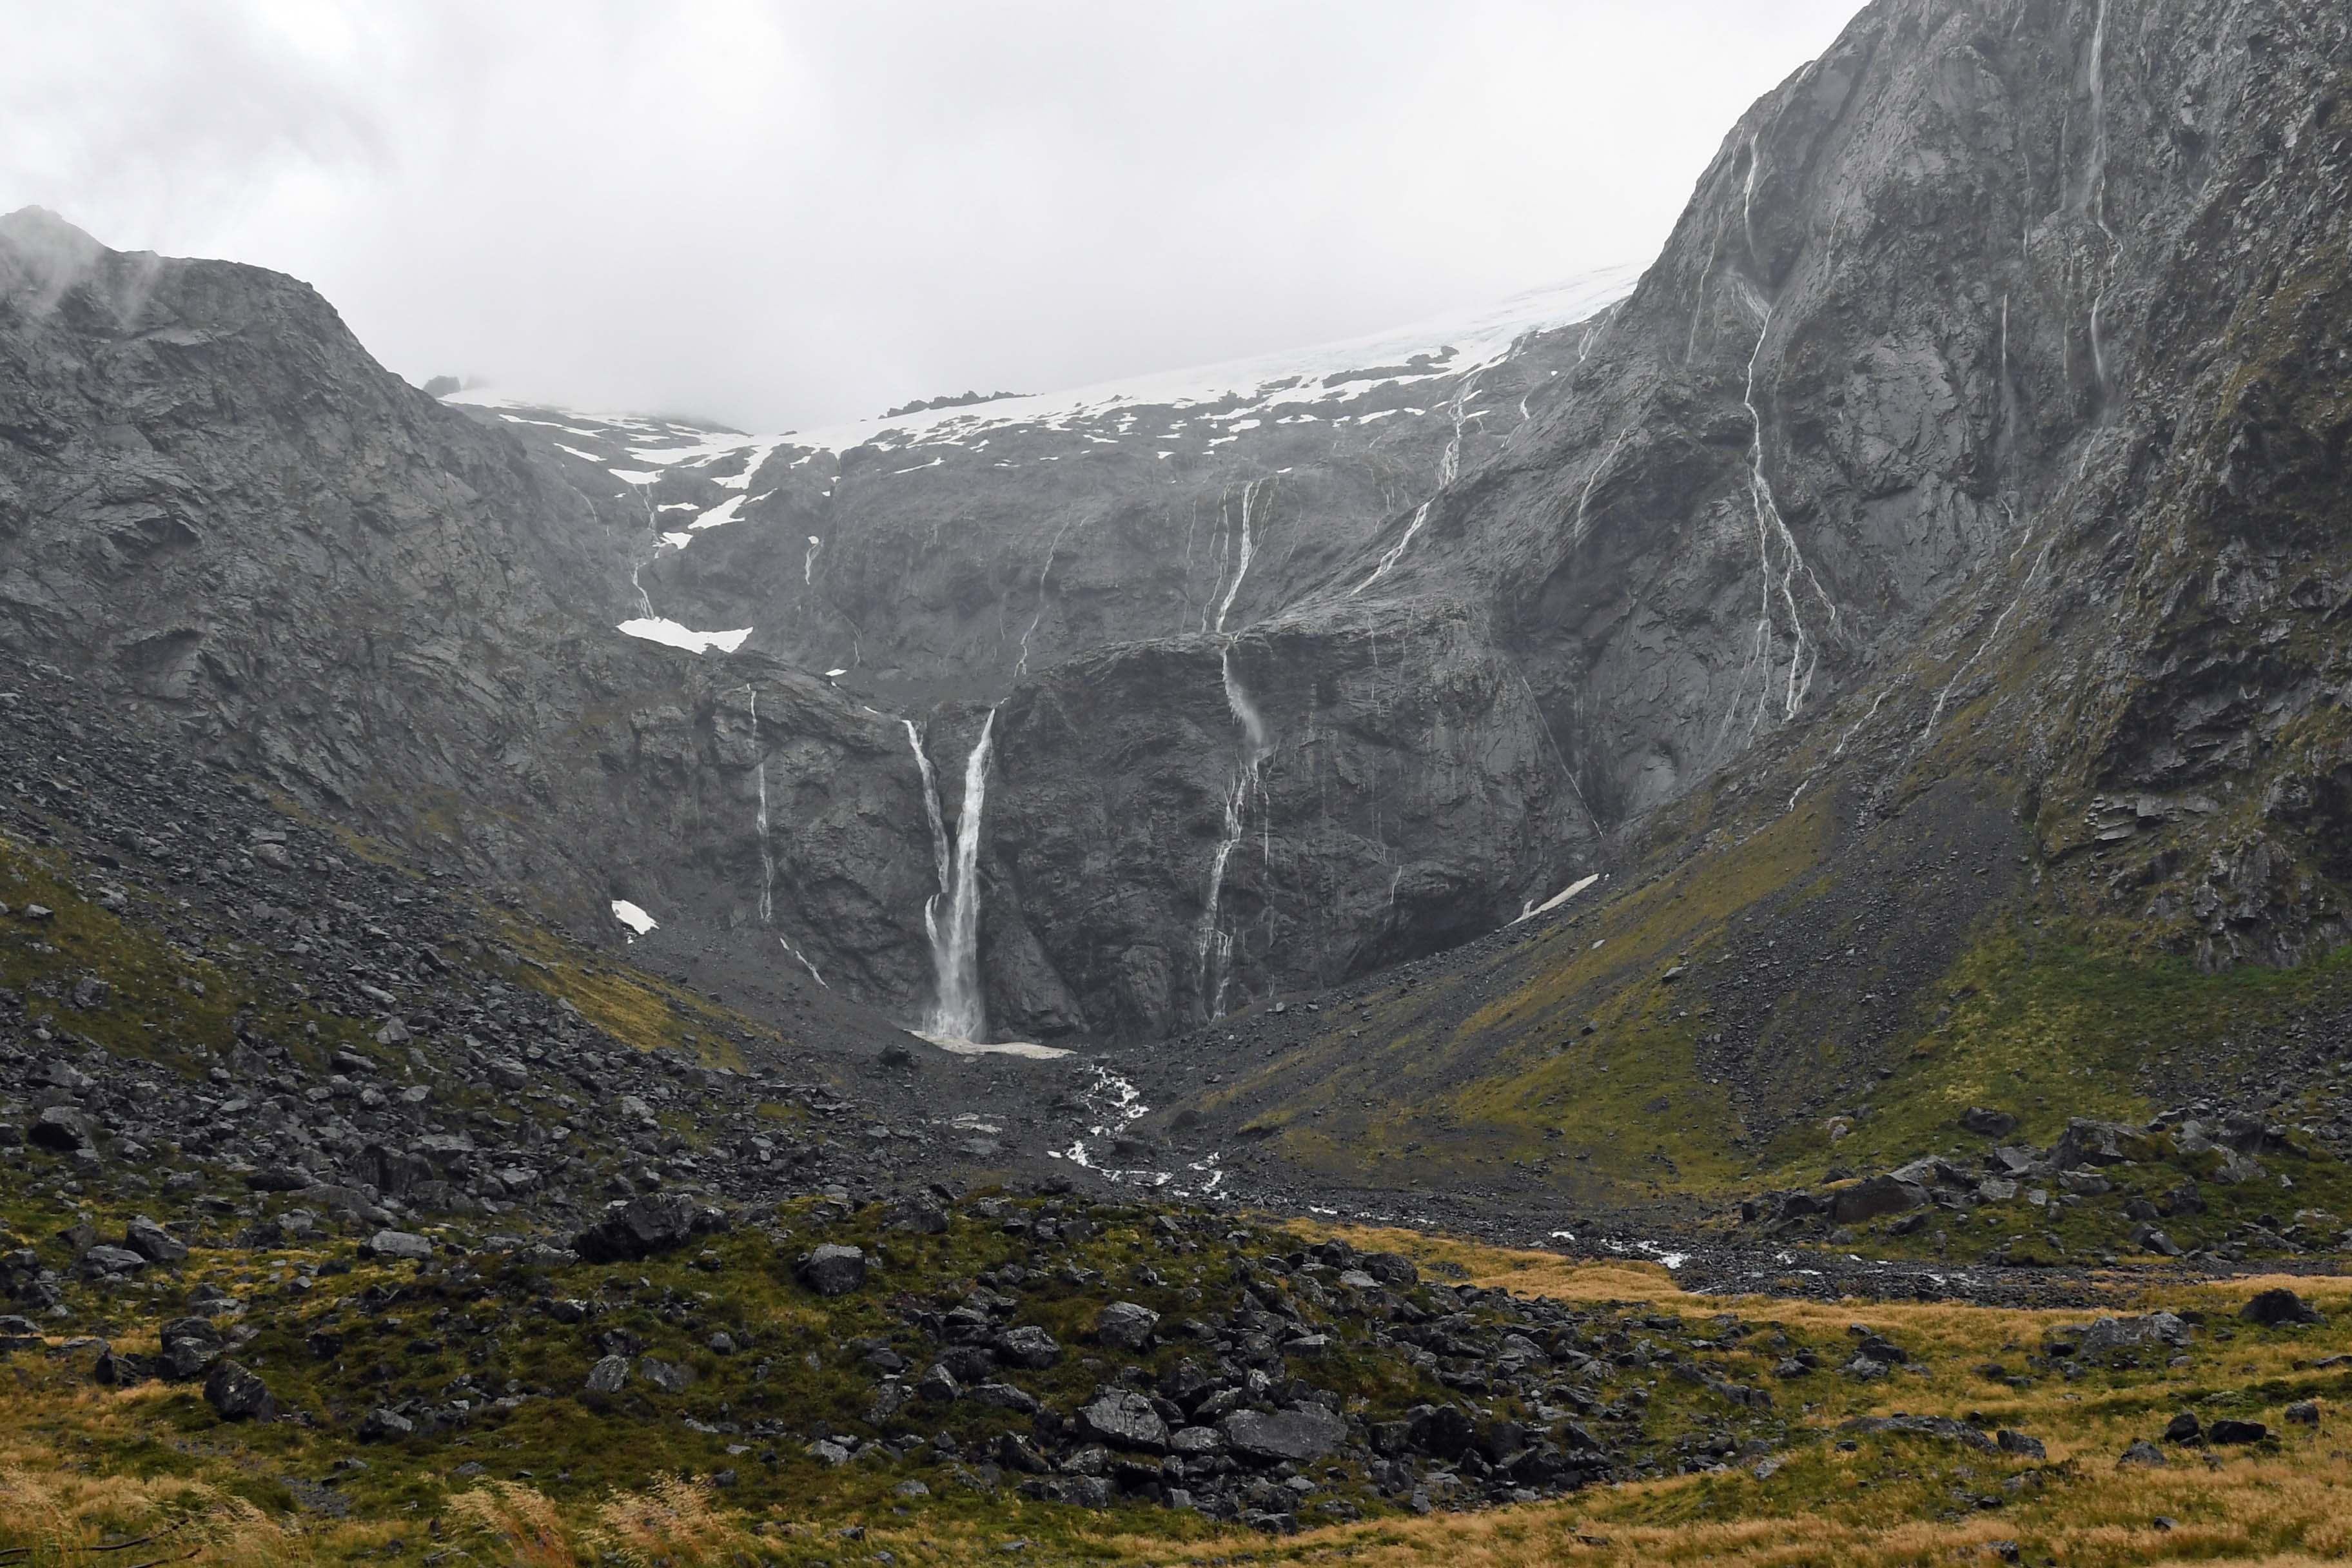 dg317643. waterfalls. milford sound highway. south island. new zealand. 23.1.19crop